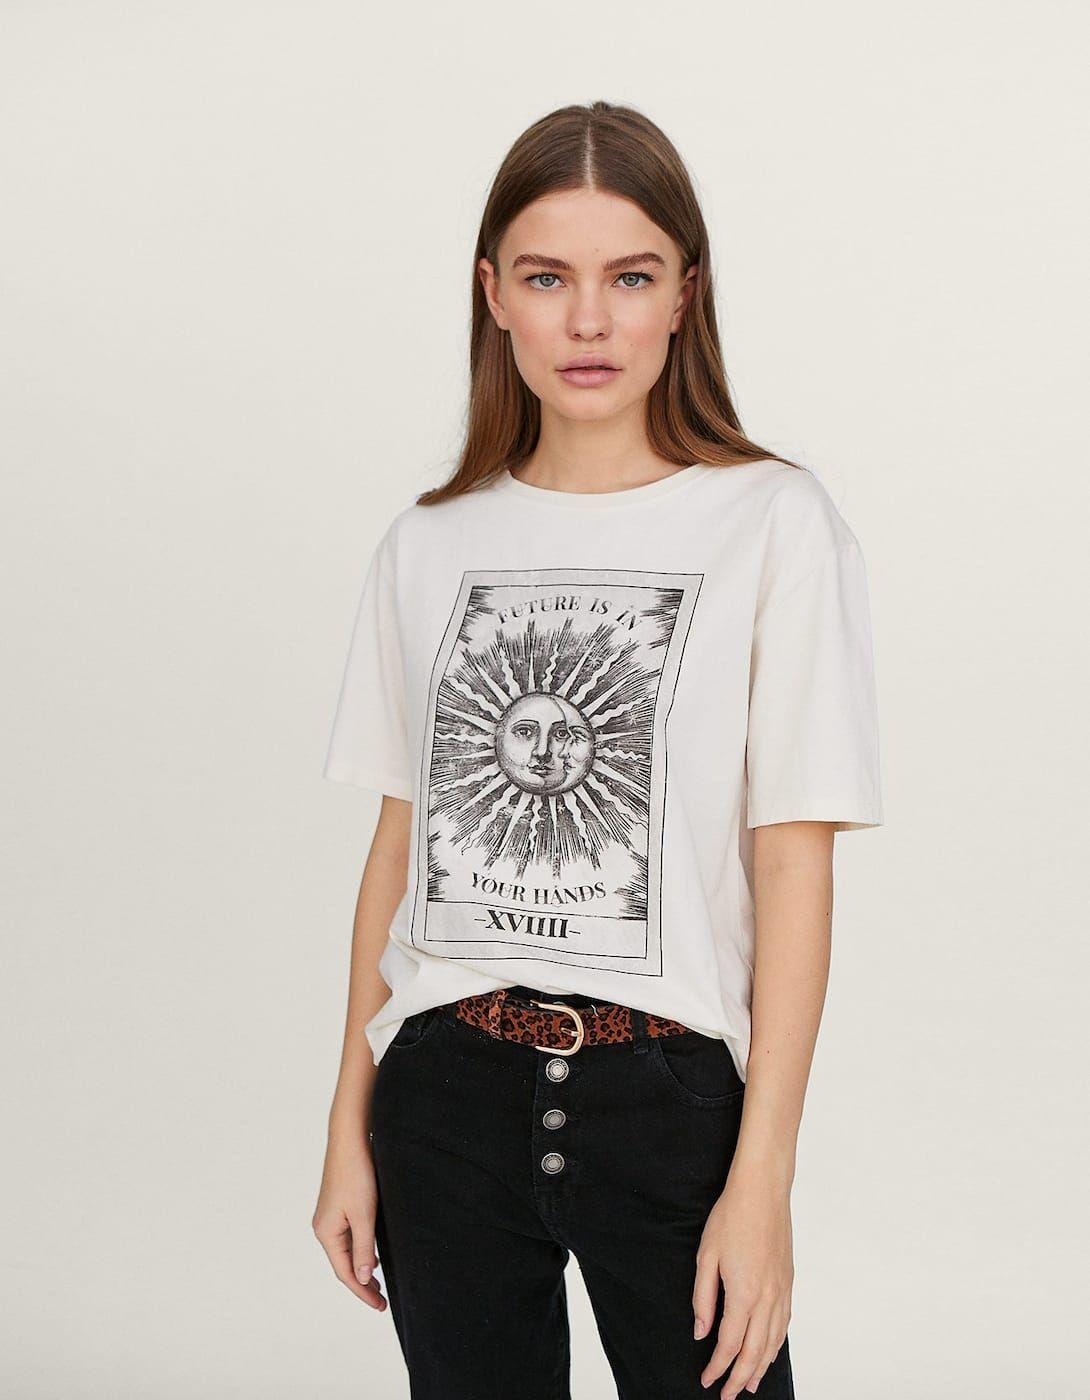 Koszulka Z Astrologicznym Nadrukiem Koszulki Stradivarius